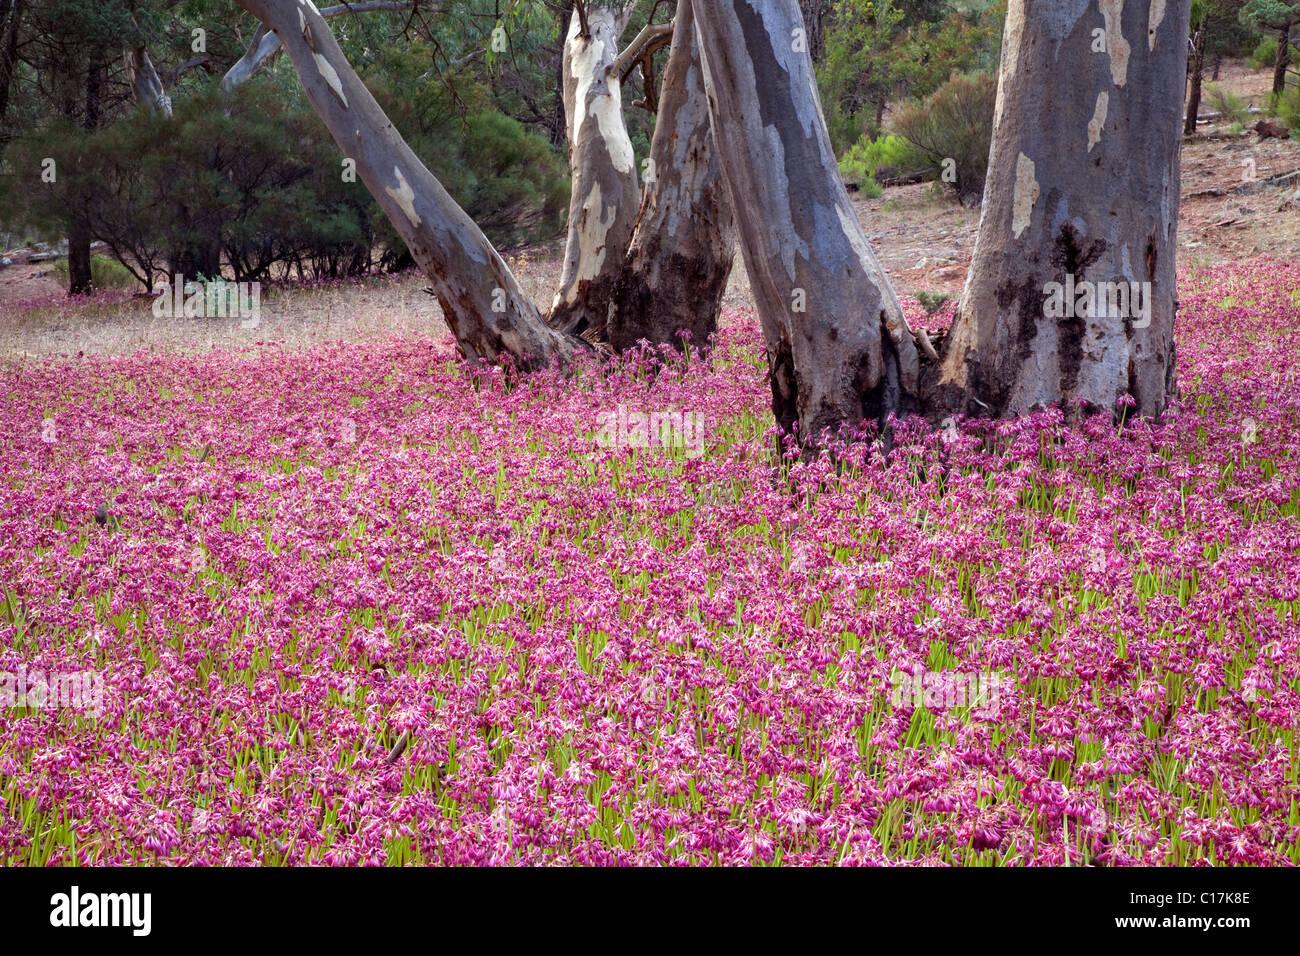 garland lilies (Calostemma purpureum), Flinder Ranges National Park, South Australia, Australia - Stock Image